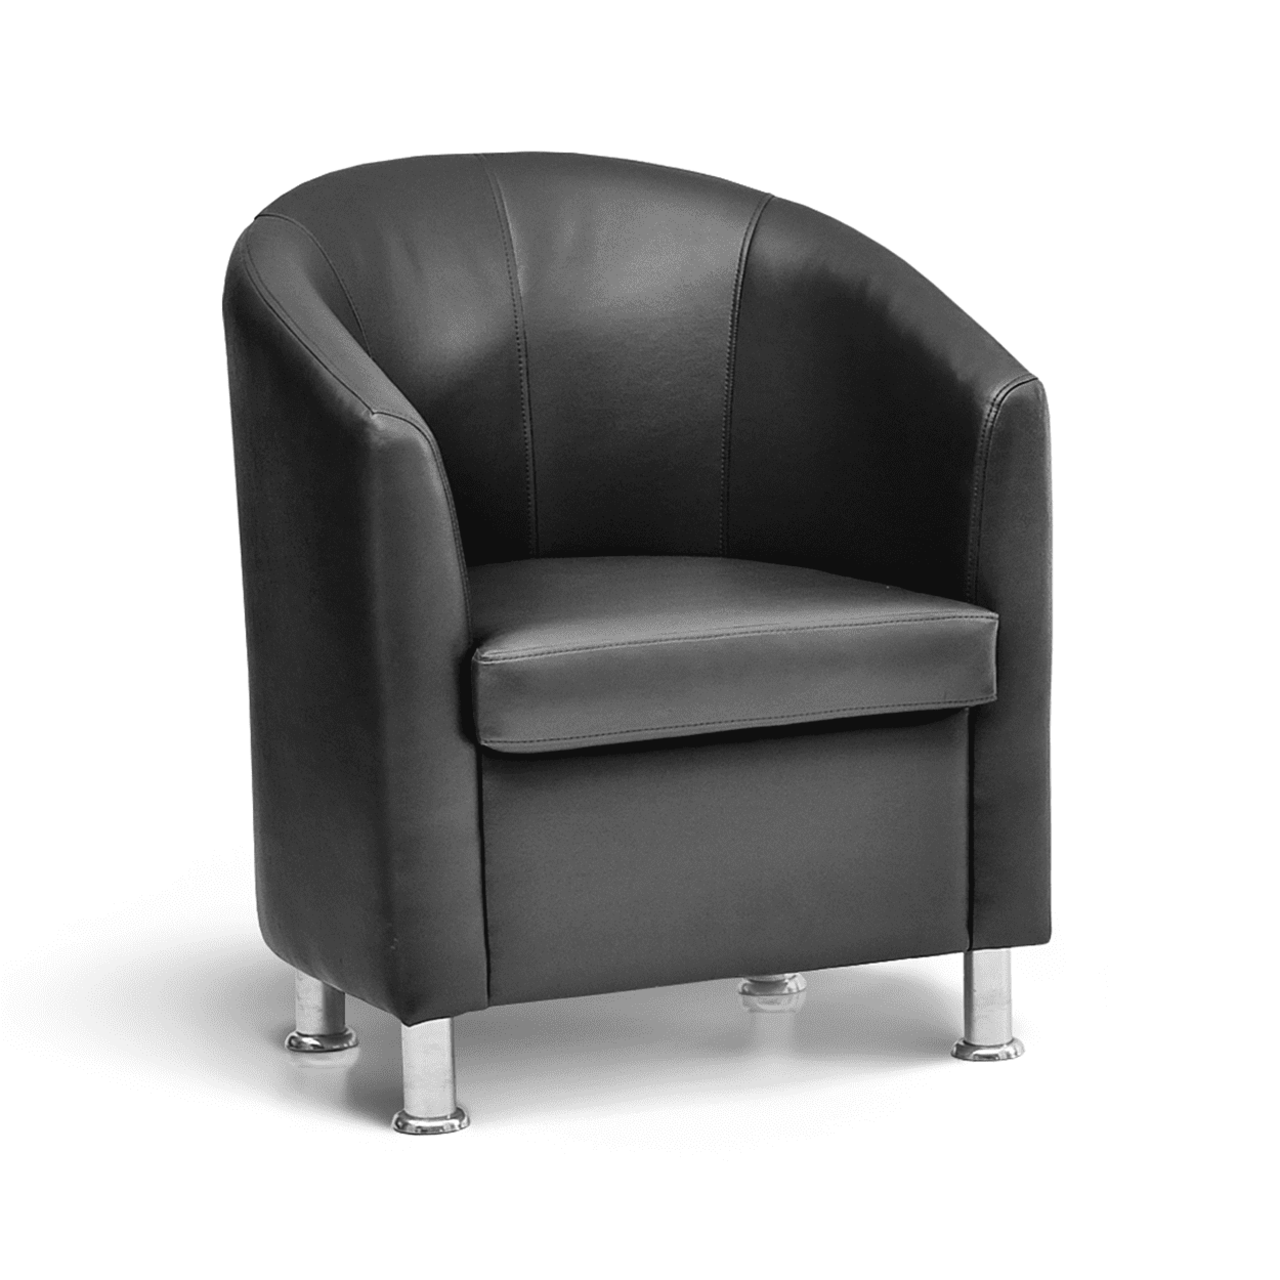 Кресло  Тэо 69x67x88 - фото 1